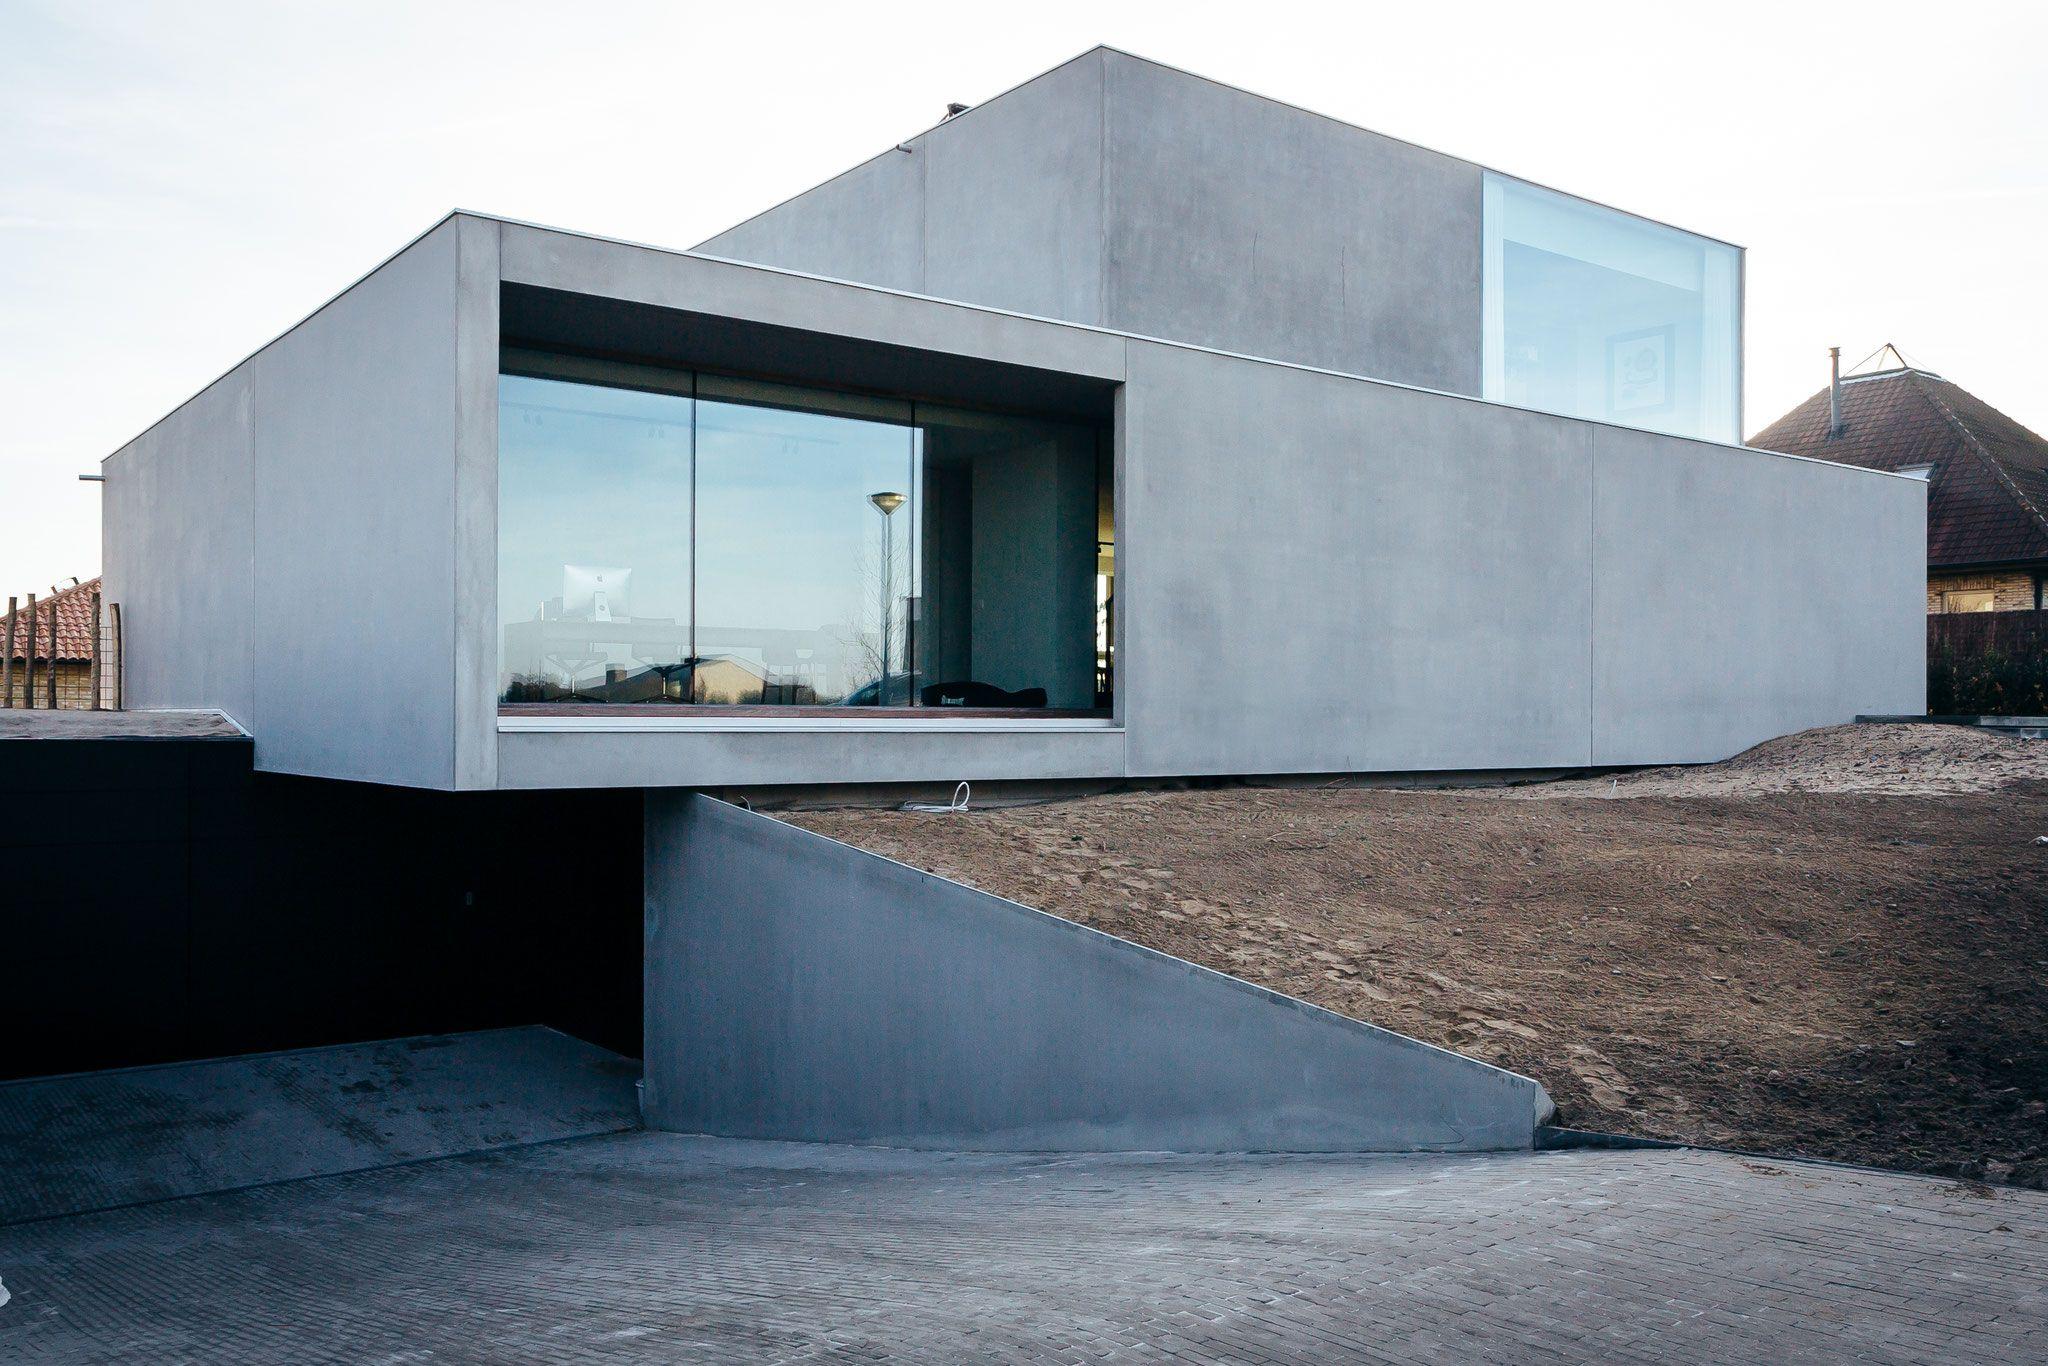 Beton Garage Prefab : Snel huizen bouw modulair bouwen prefab beton huizen huizen in